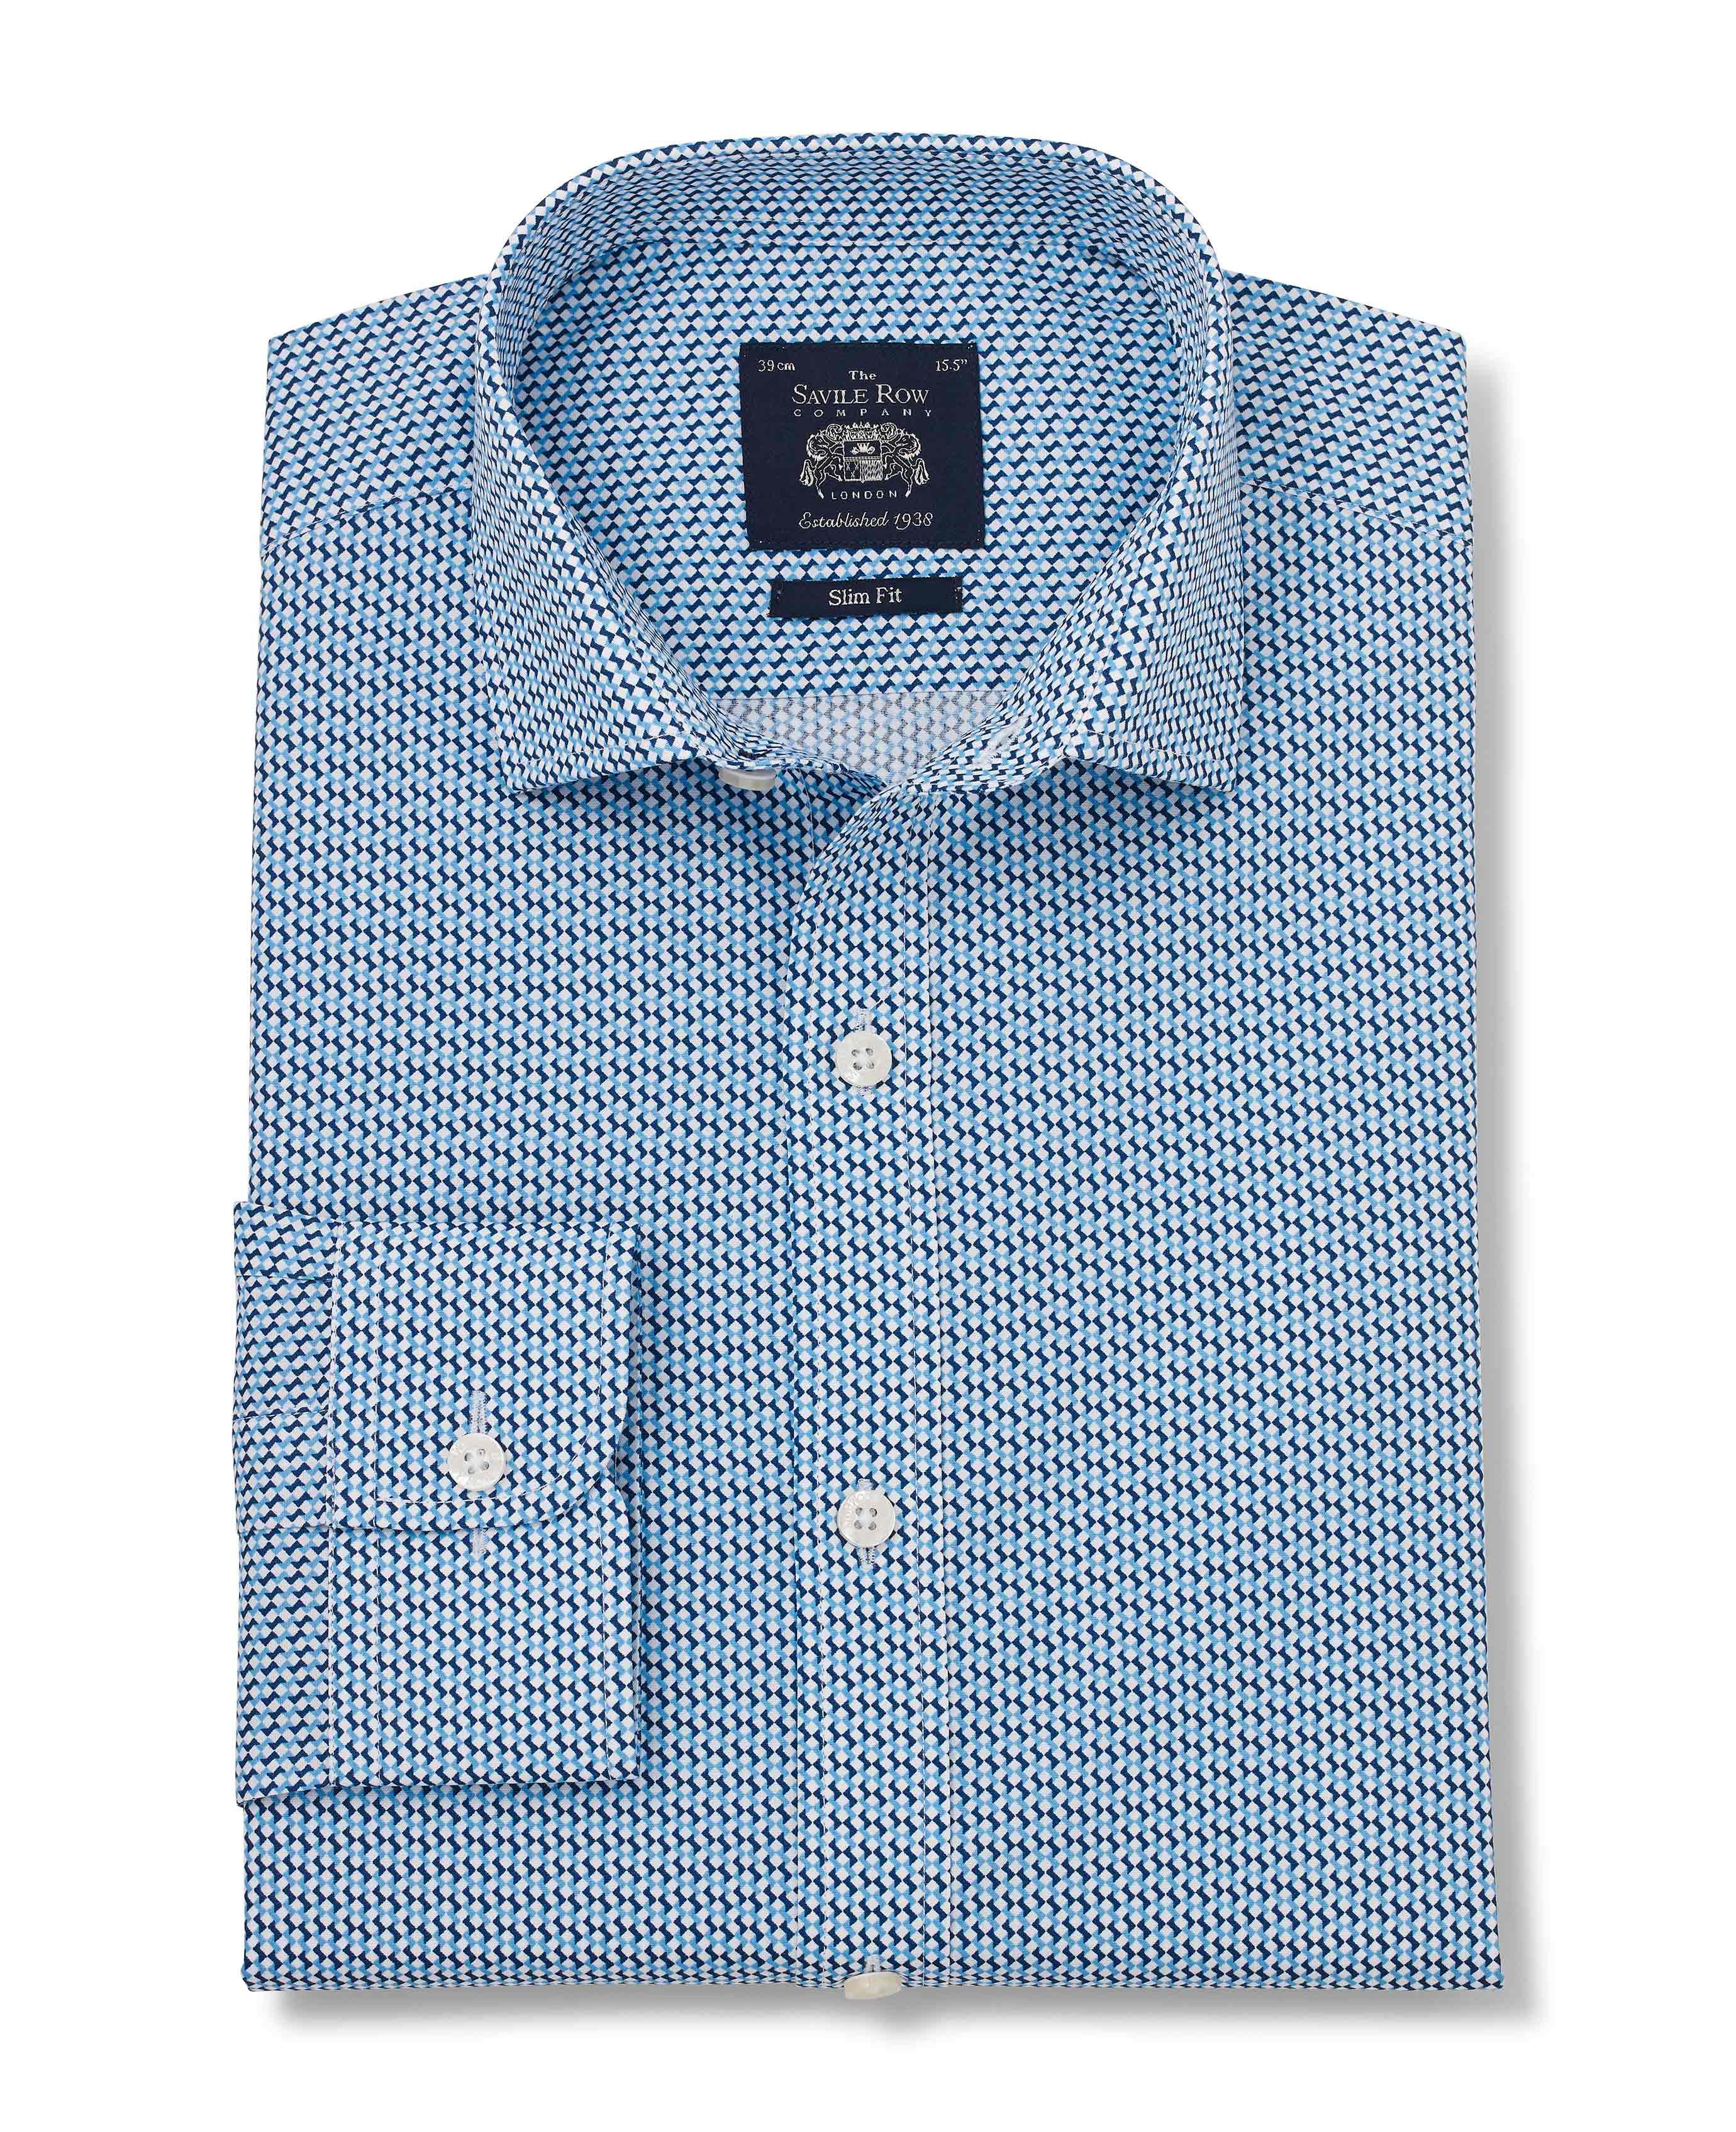 Savile-Row-Men-039-s-White-Blue-Geo-Print-Slim-Fit-Shirt-Single-Cuff